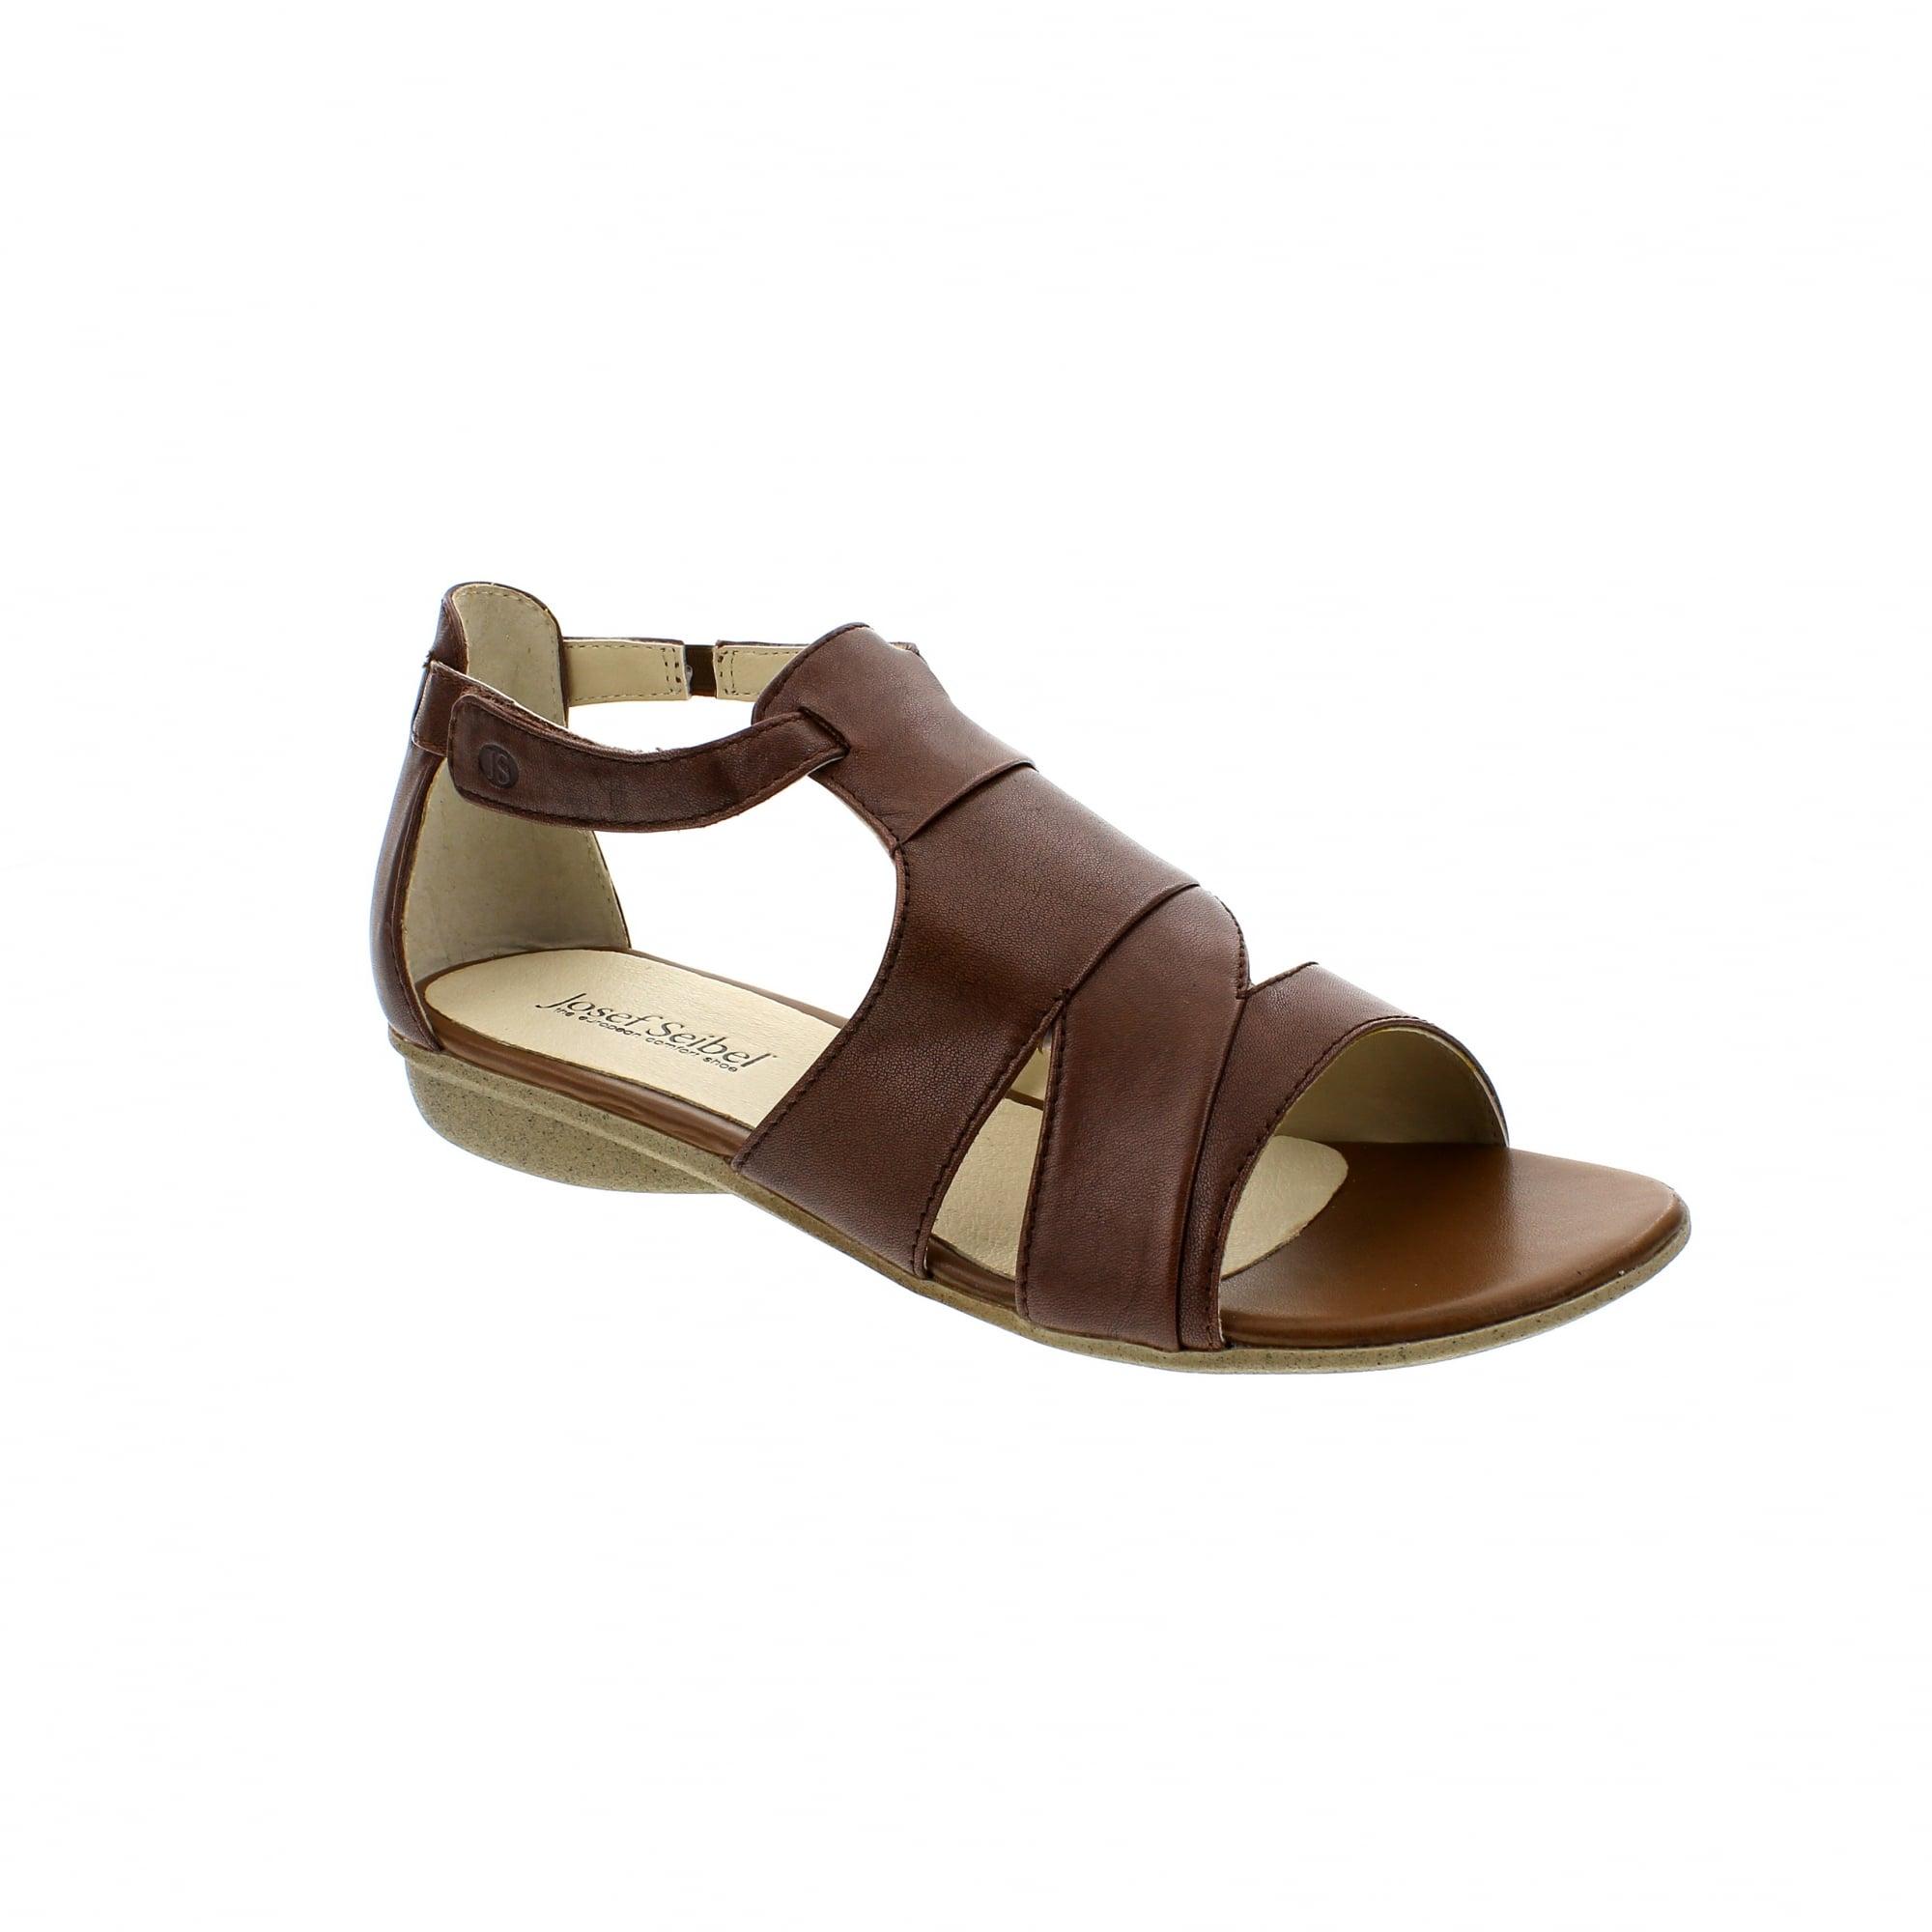 82e607f302c57 Josef Seibel Fabia 03 87503-971340 Womens Sandals